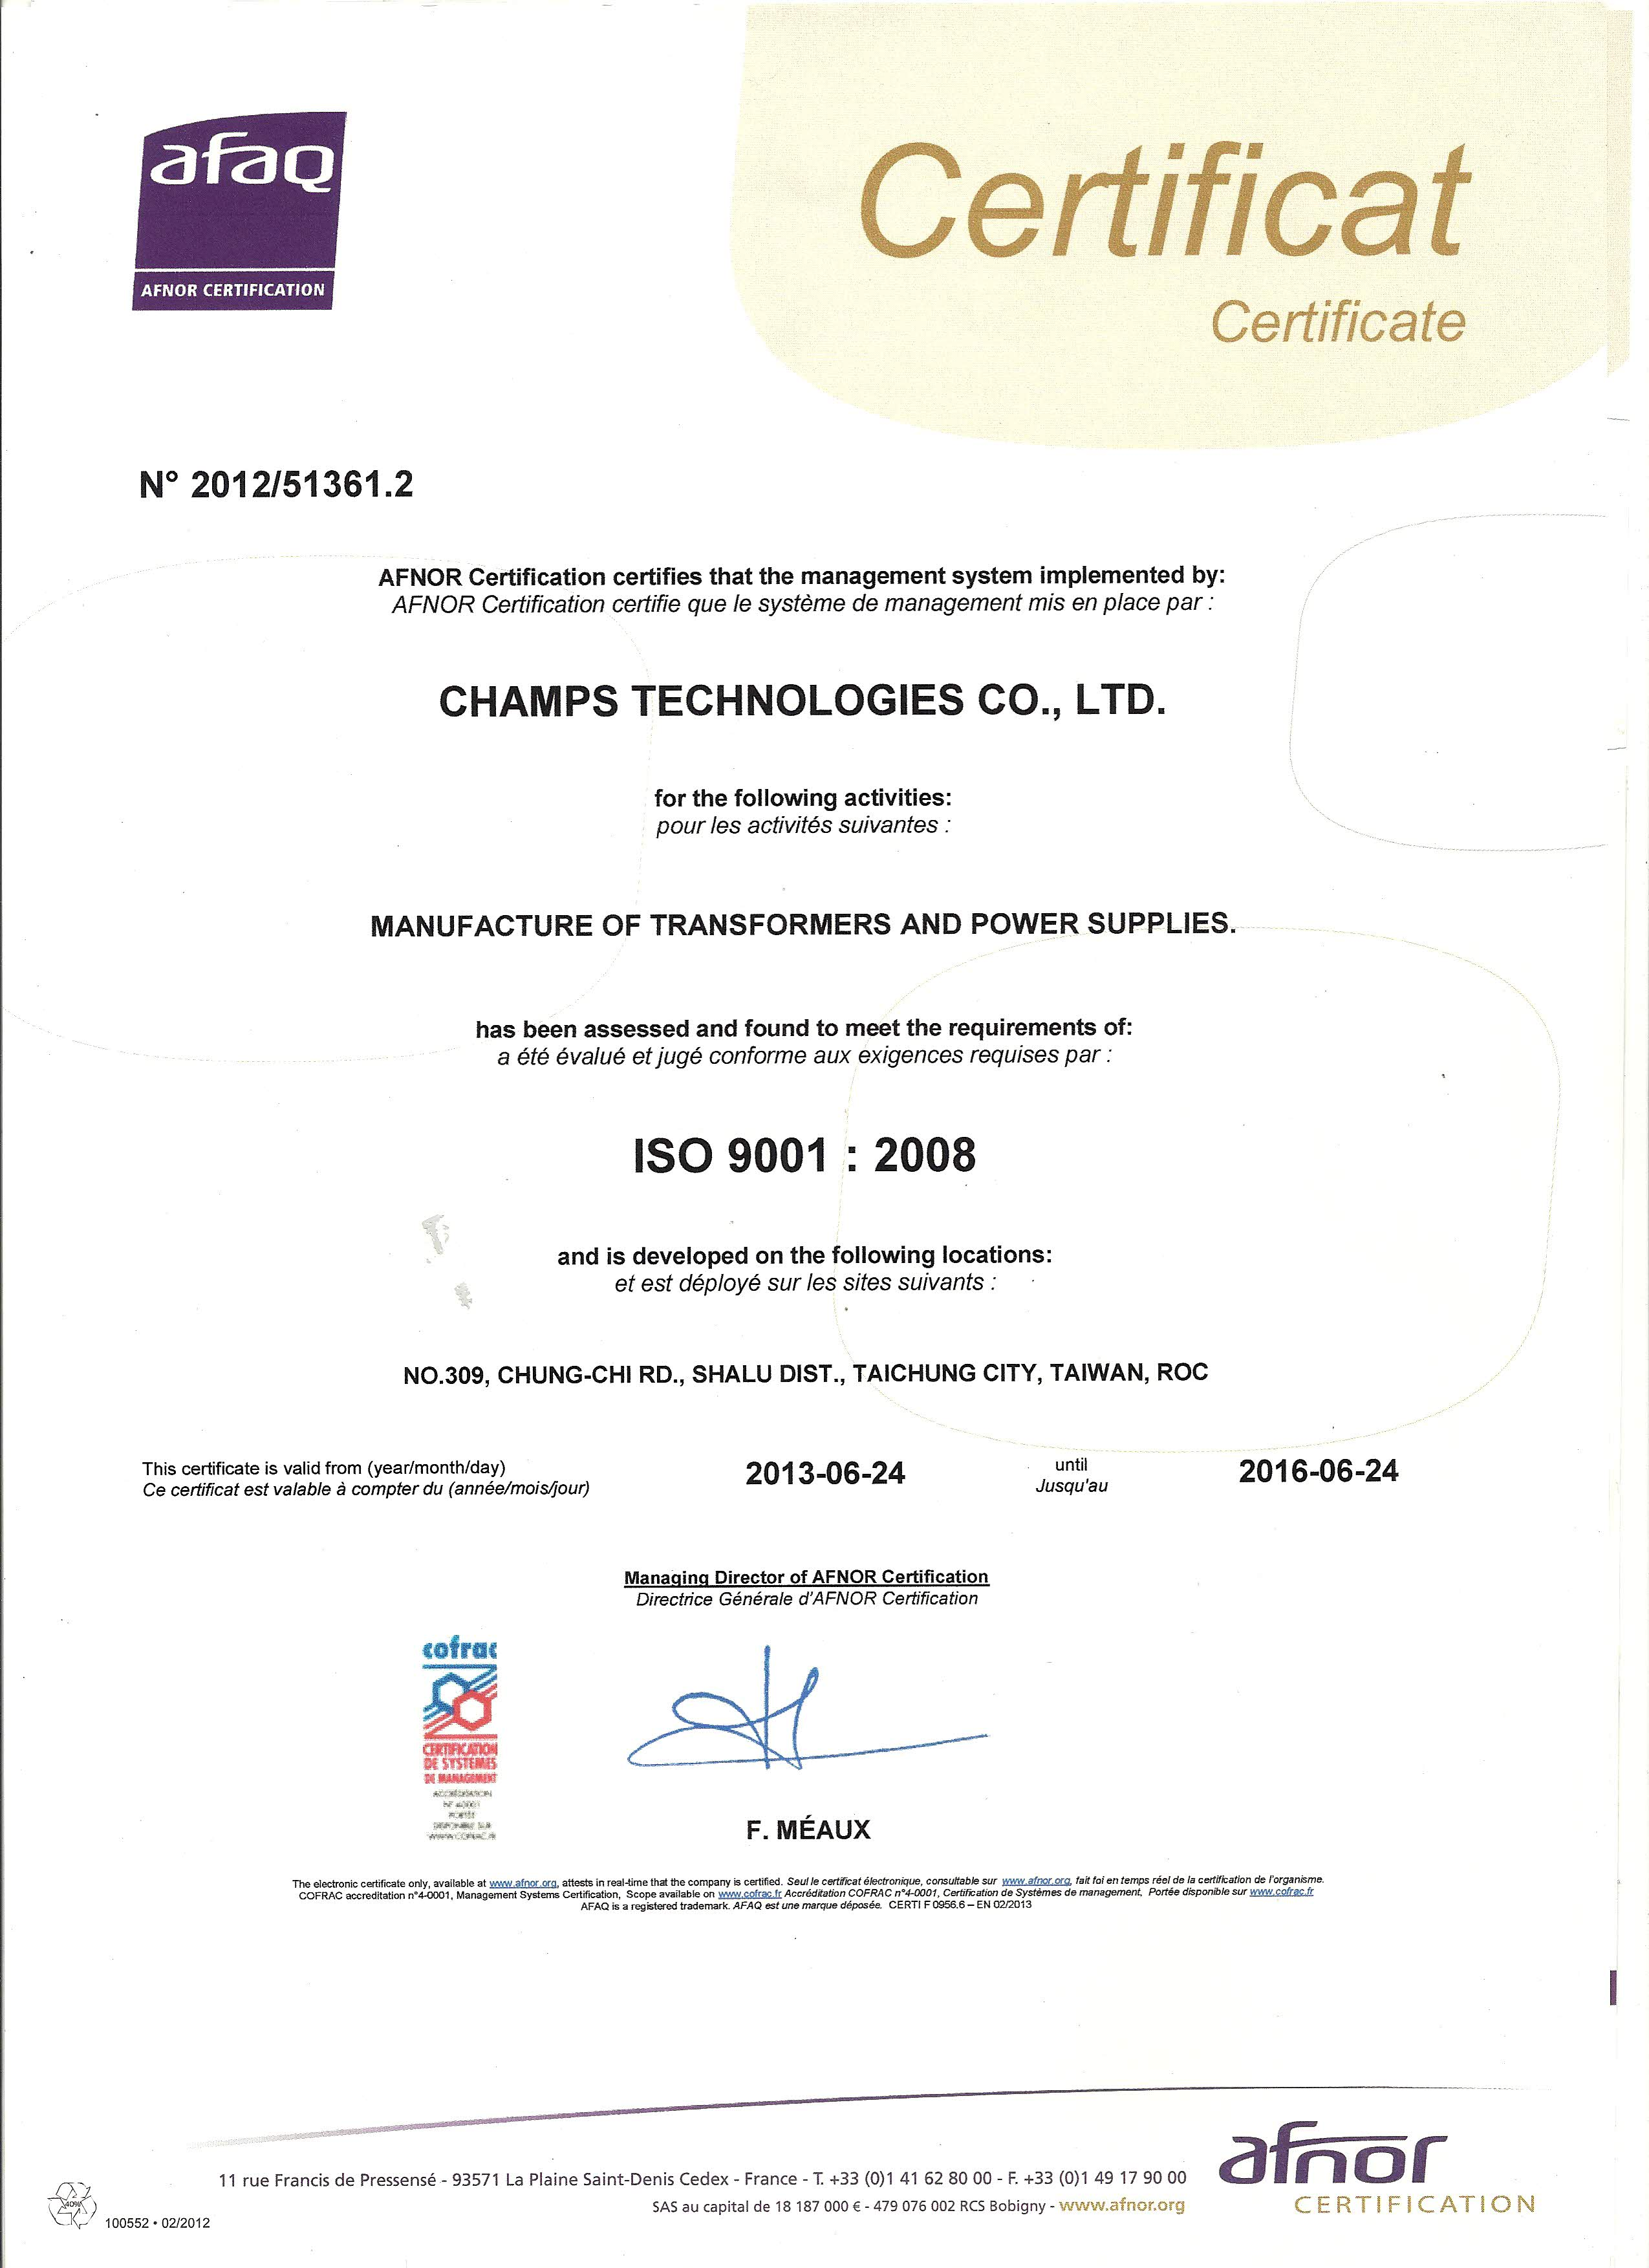 Quality Assurance Champs Technologies